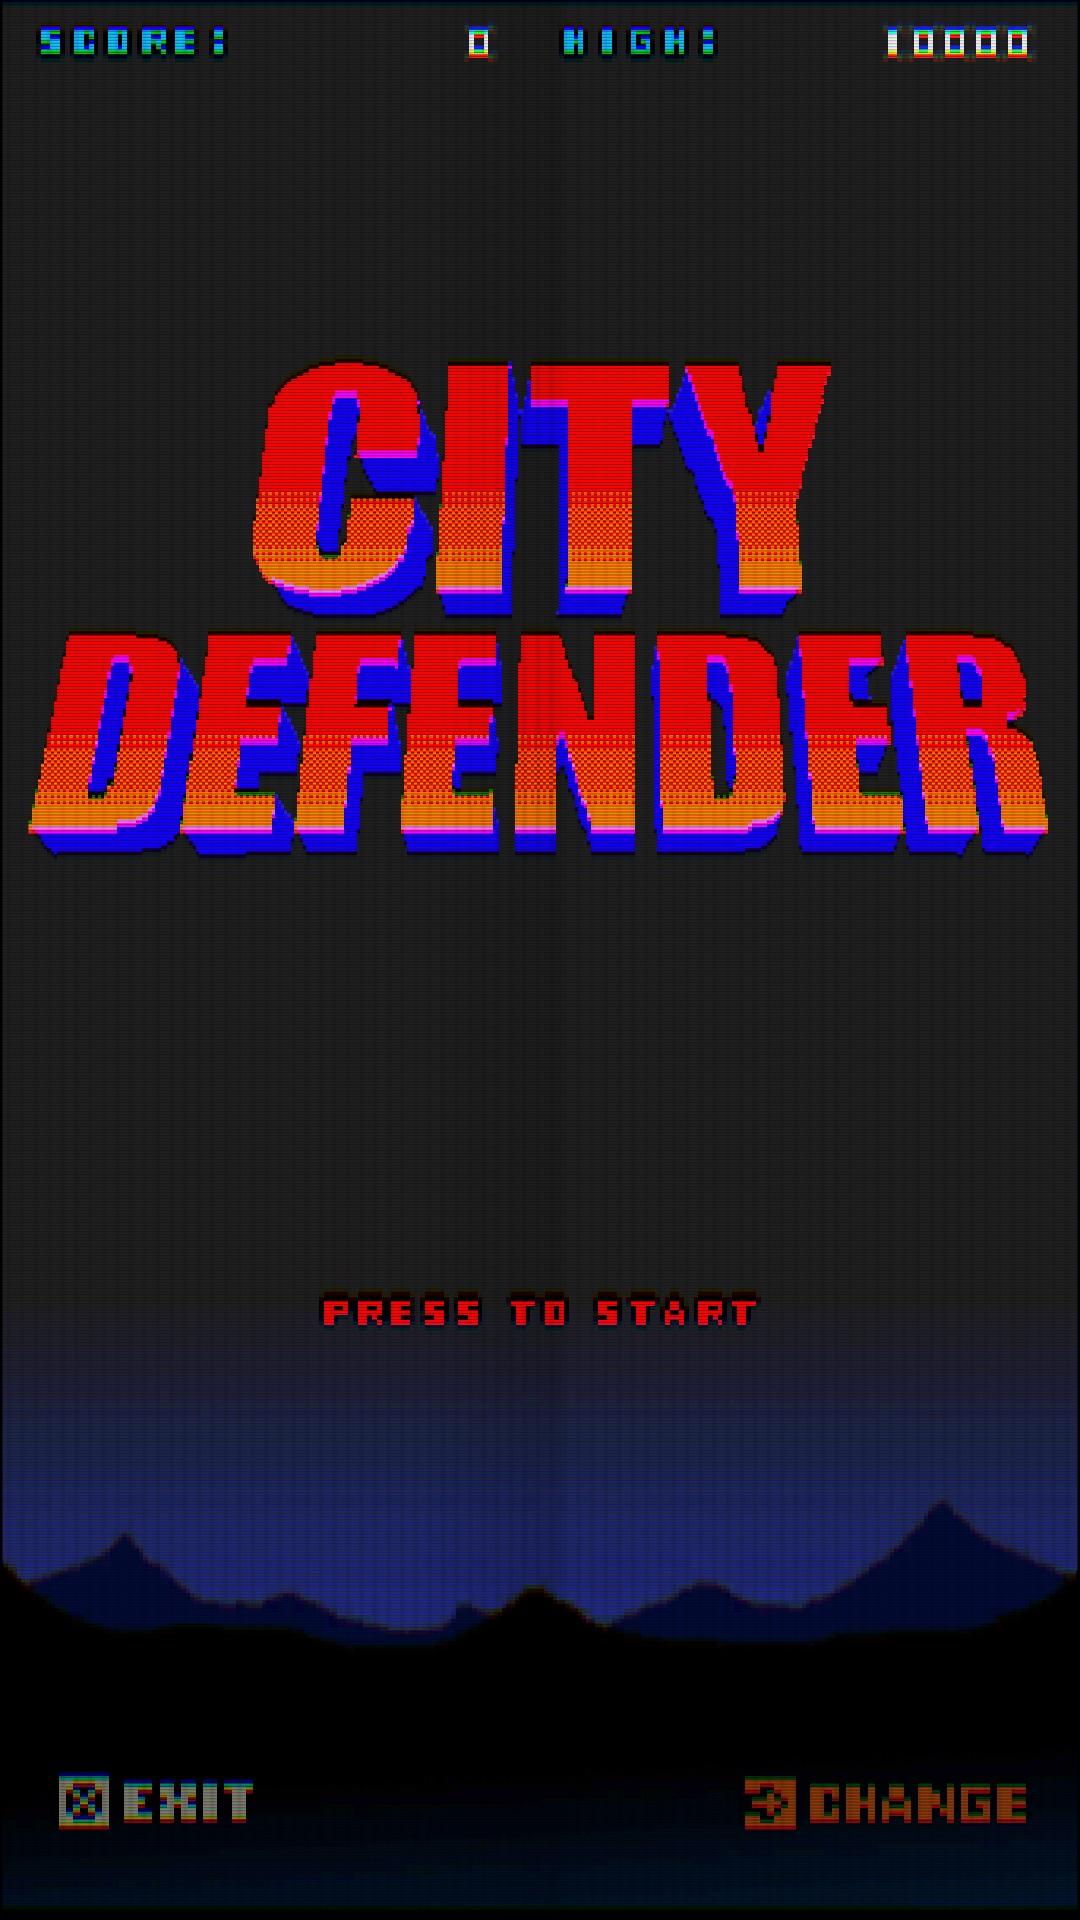 「City Defender」-タイトル.jpg